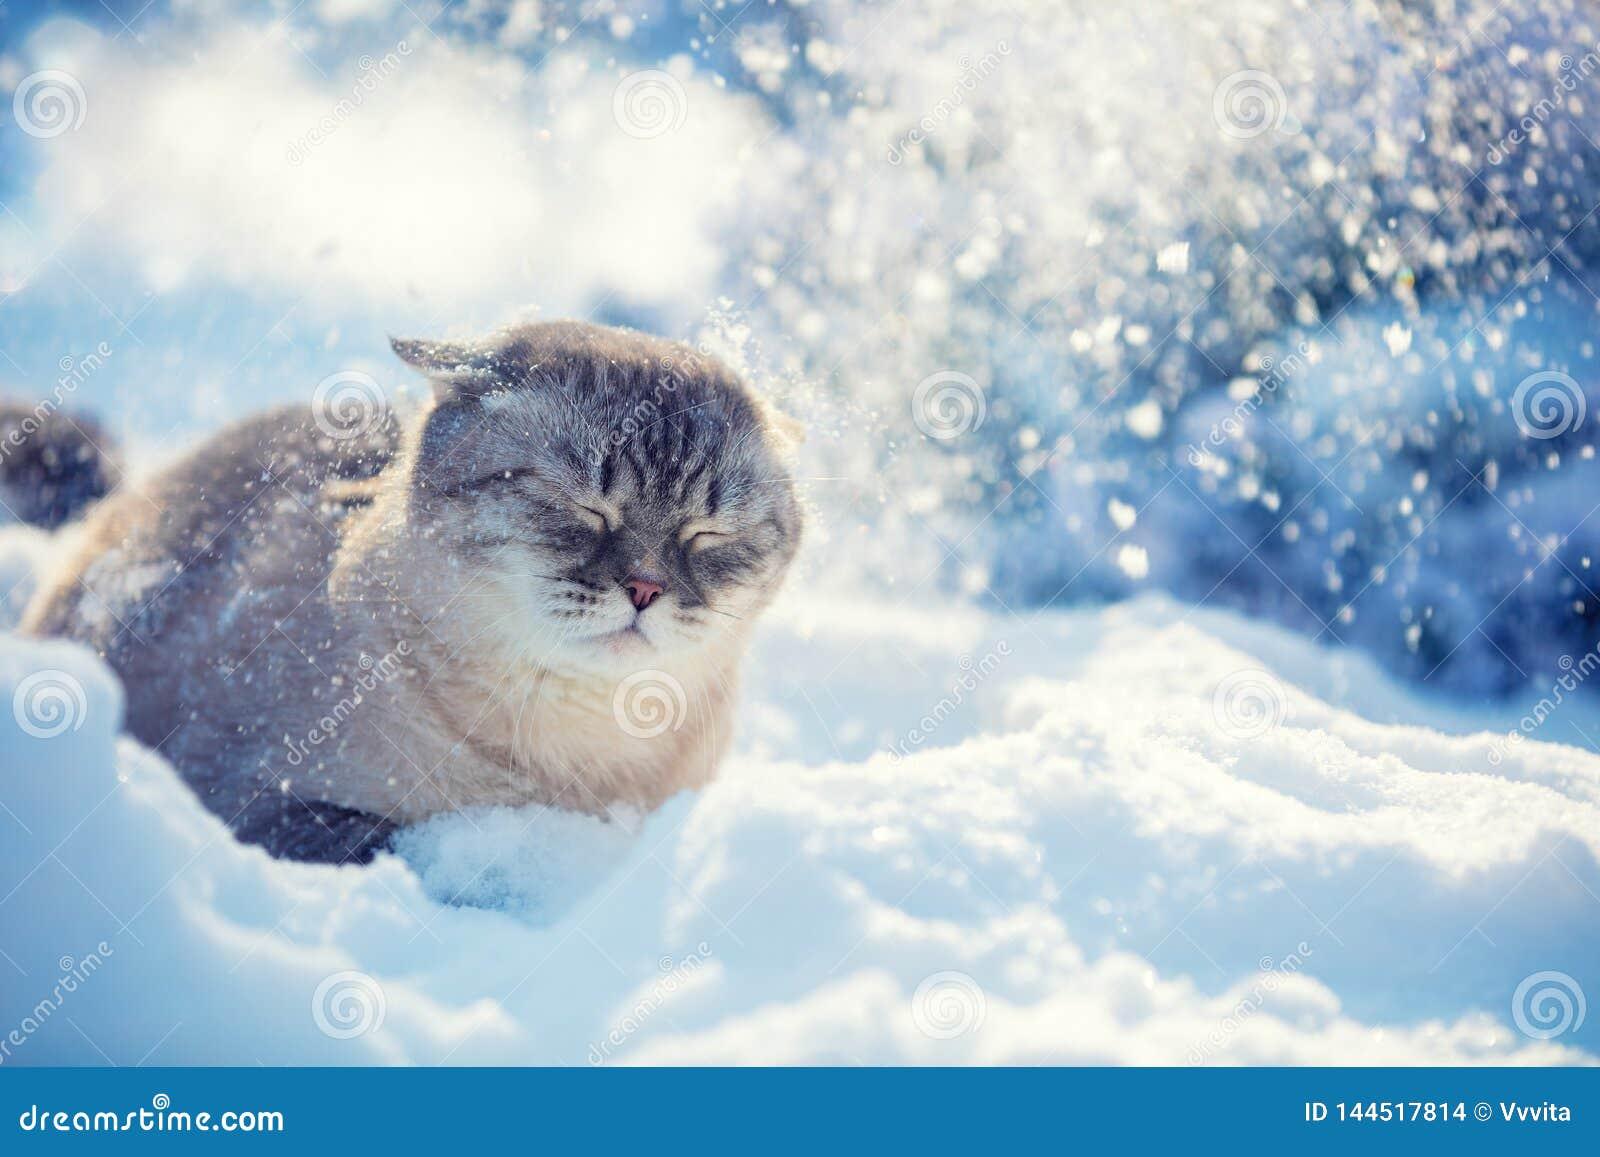 Cute Siamese Cat walking in the snow